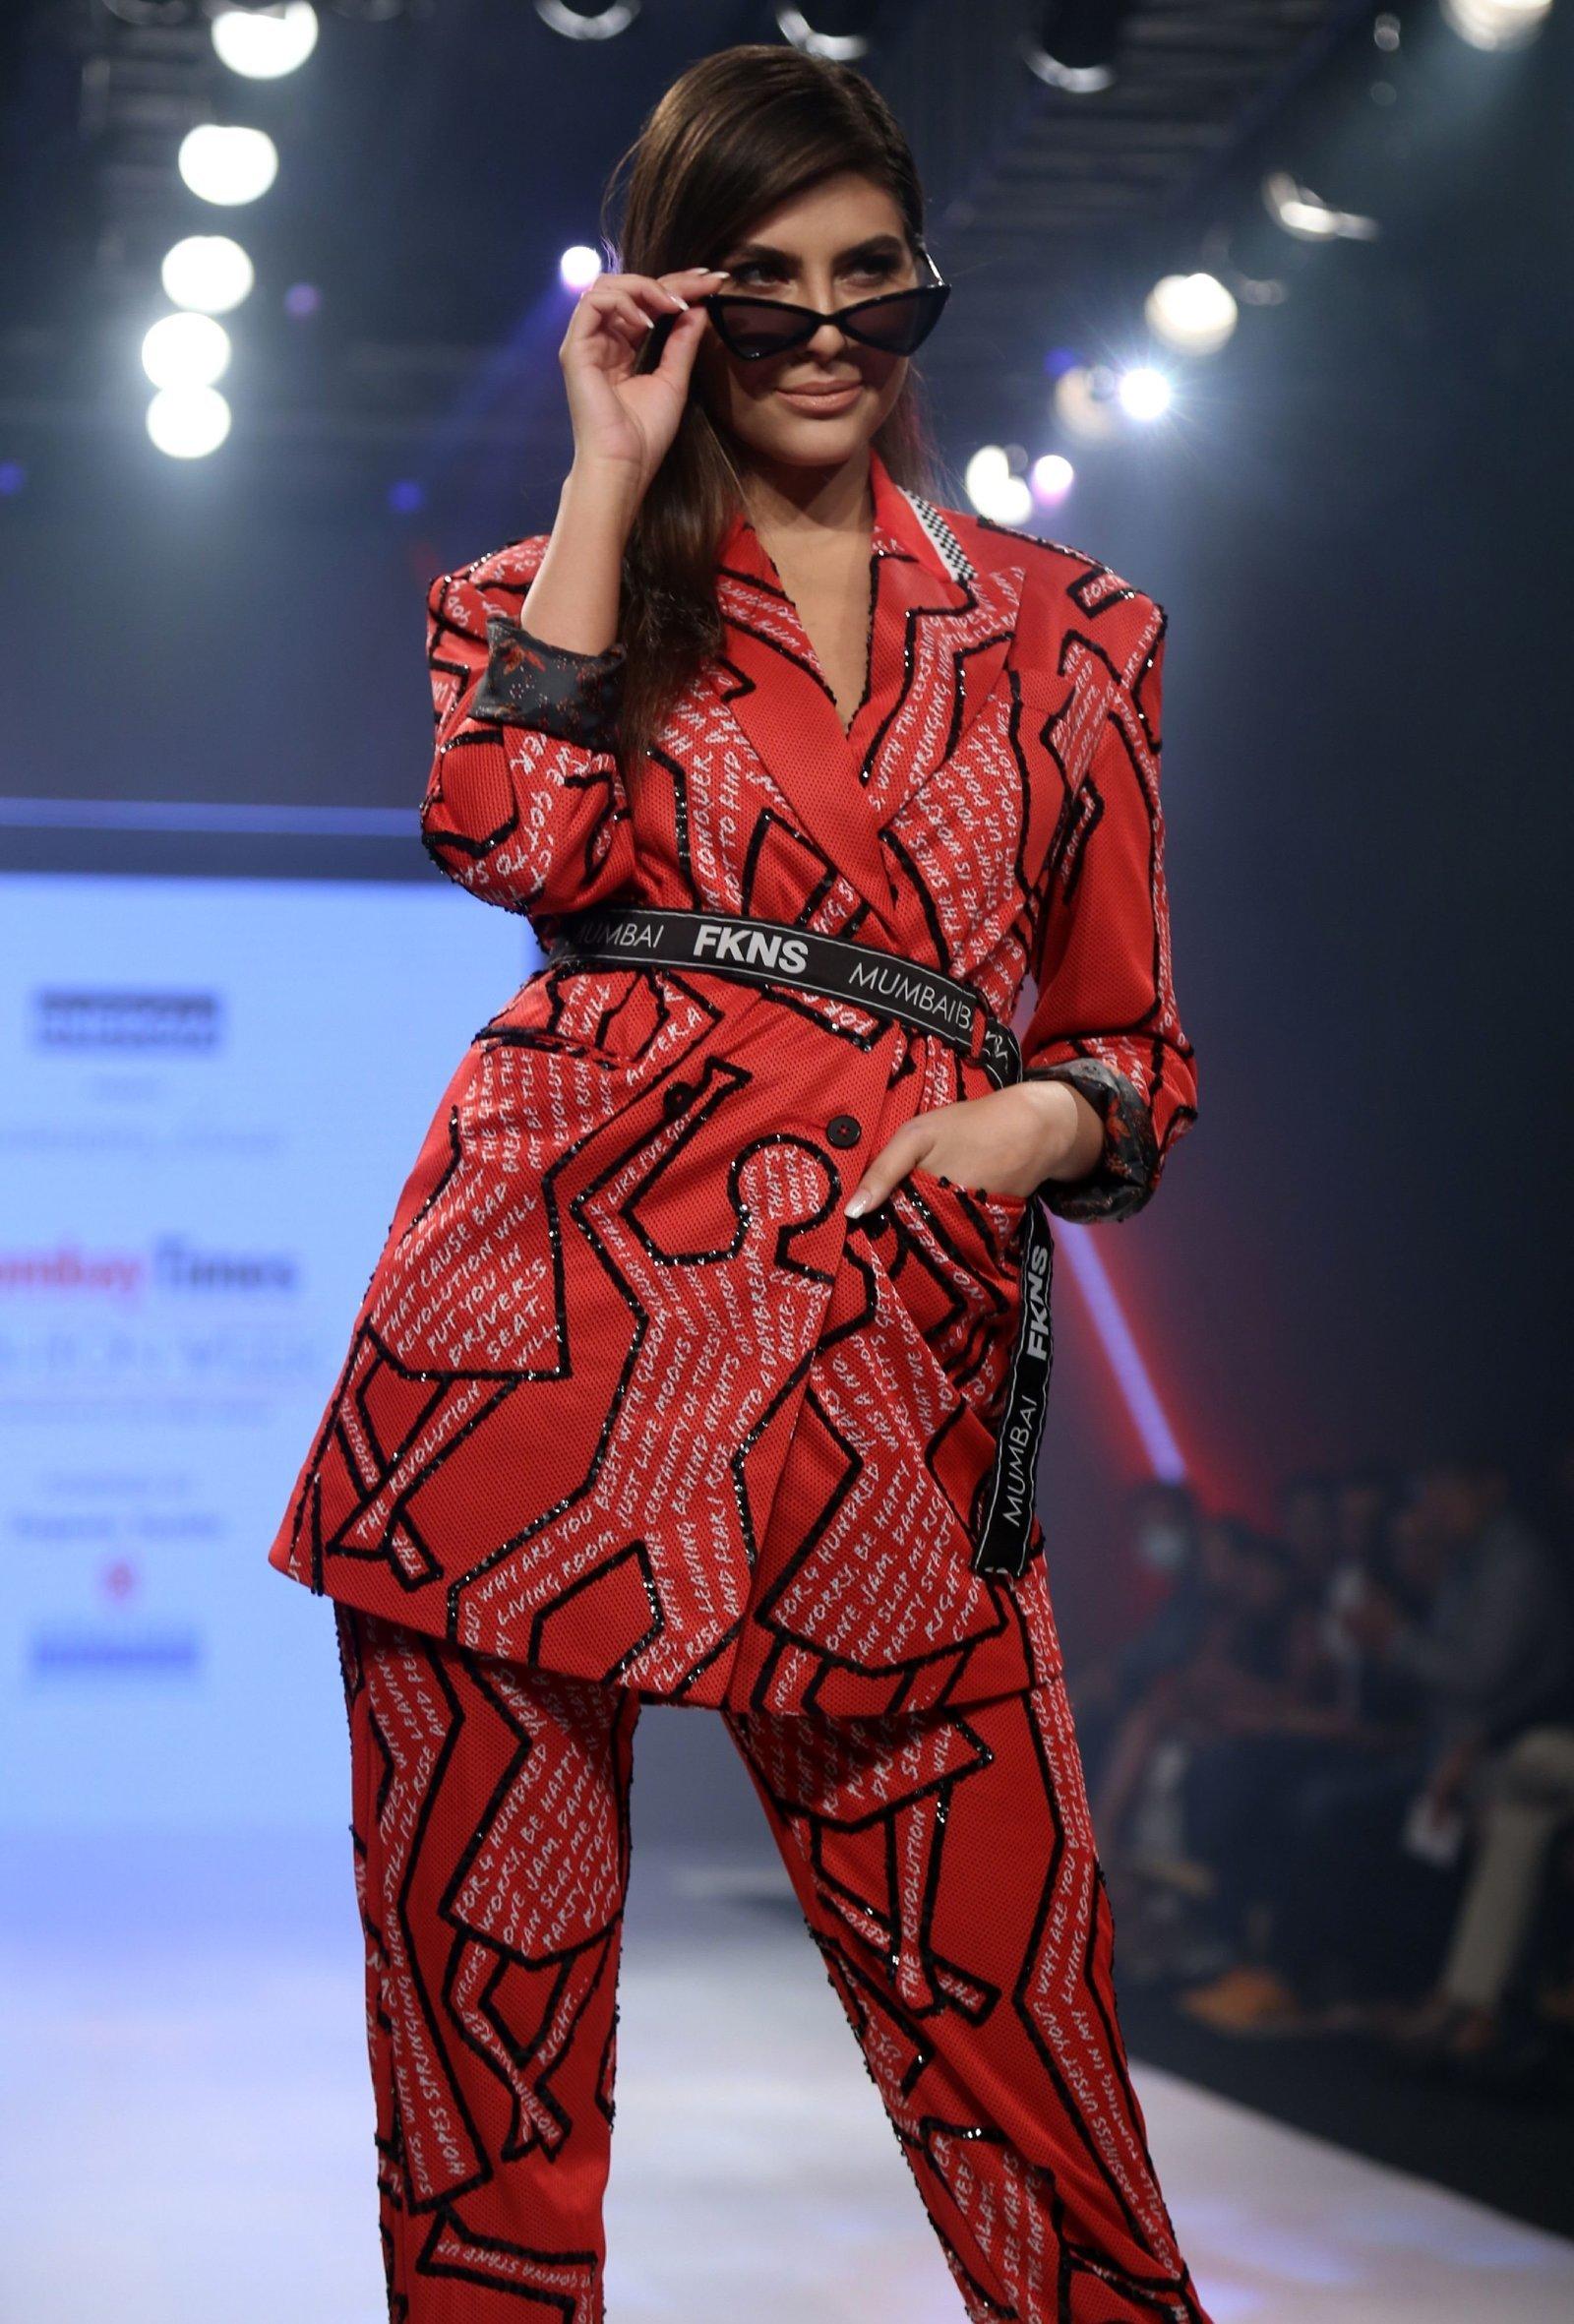 Elnaaz Norouzi - Photos: Bombay Times Fashion Week 2020 Day 3 | Picture 1726730